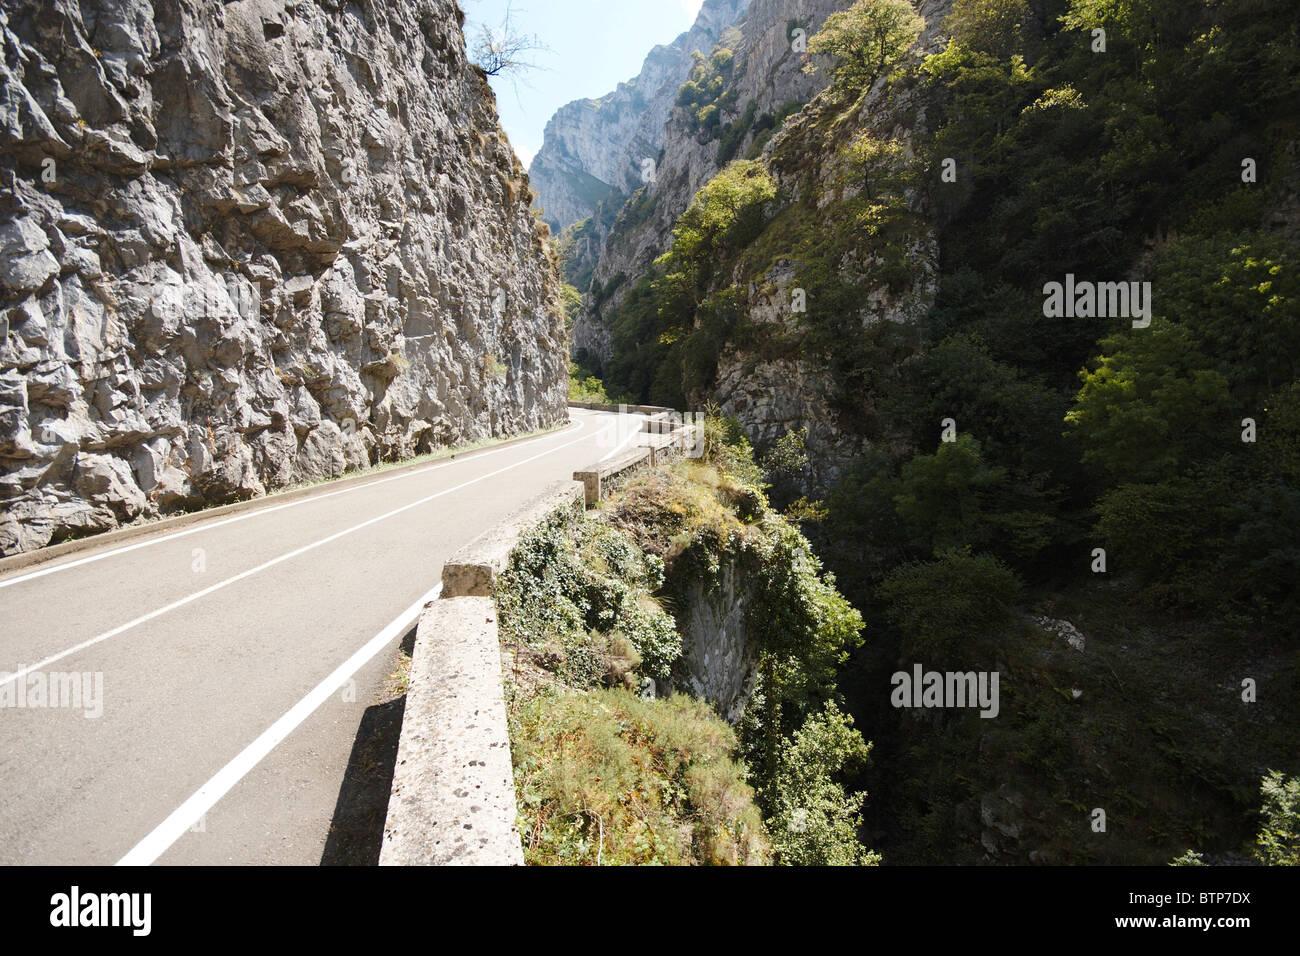 Desfiladero de los Beyos, Spain, Asturias, View of mountain road - Stock Image